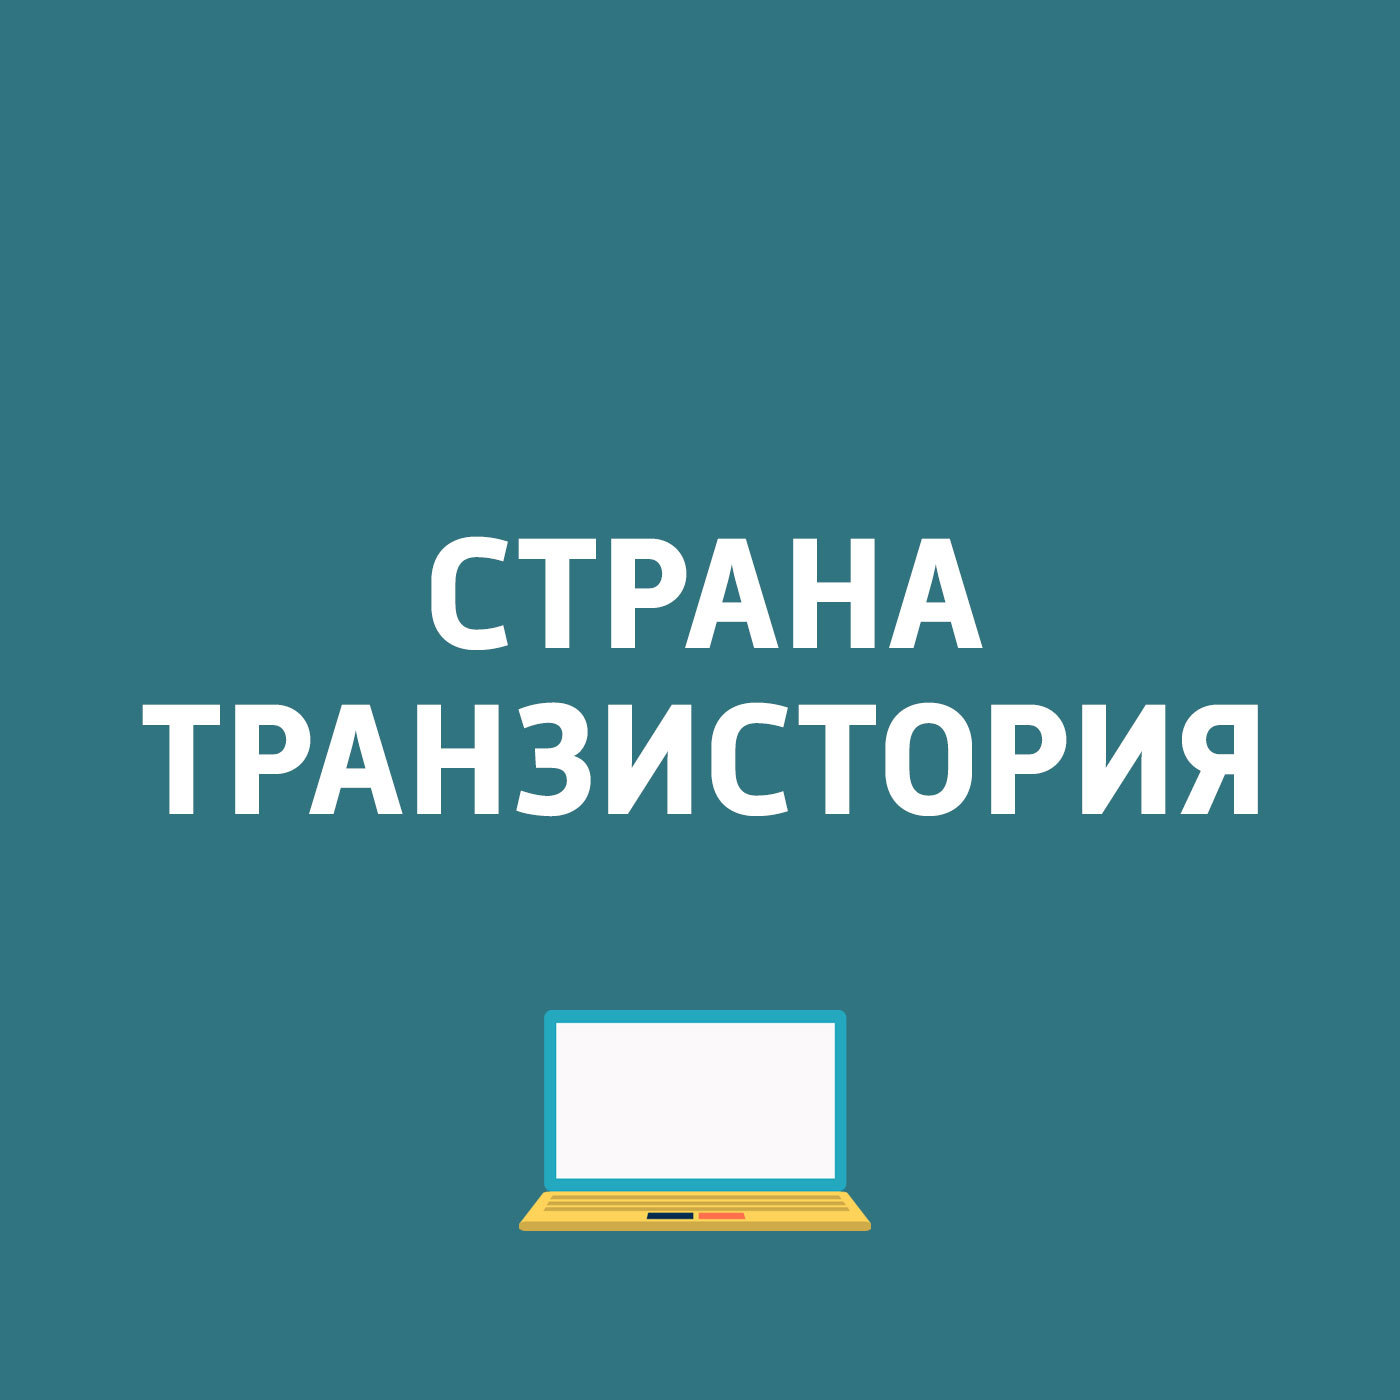 Картаев Павел AliExpress меняет правила доставки товаров; Обзор игр... картаев павел гулабджамун